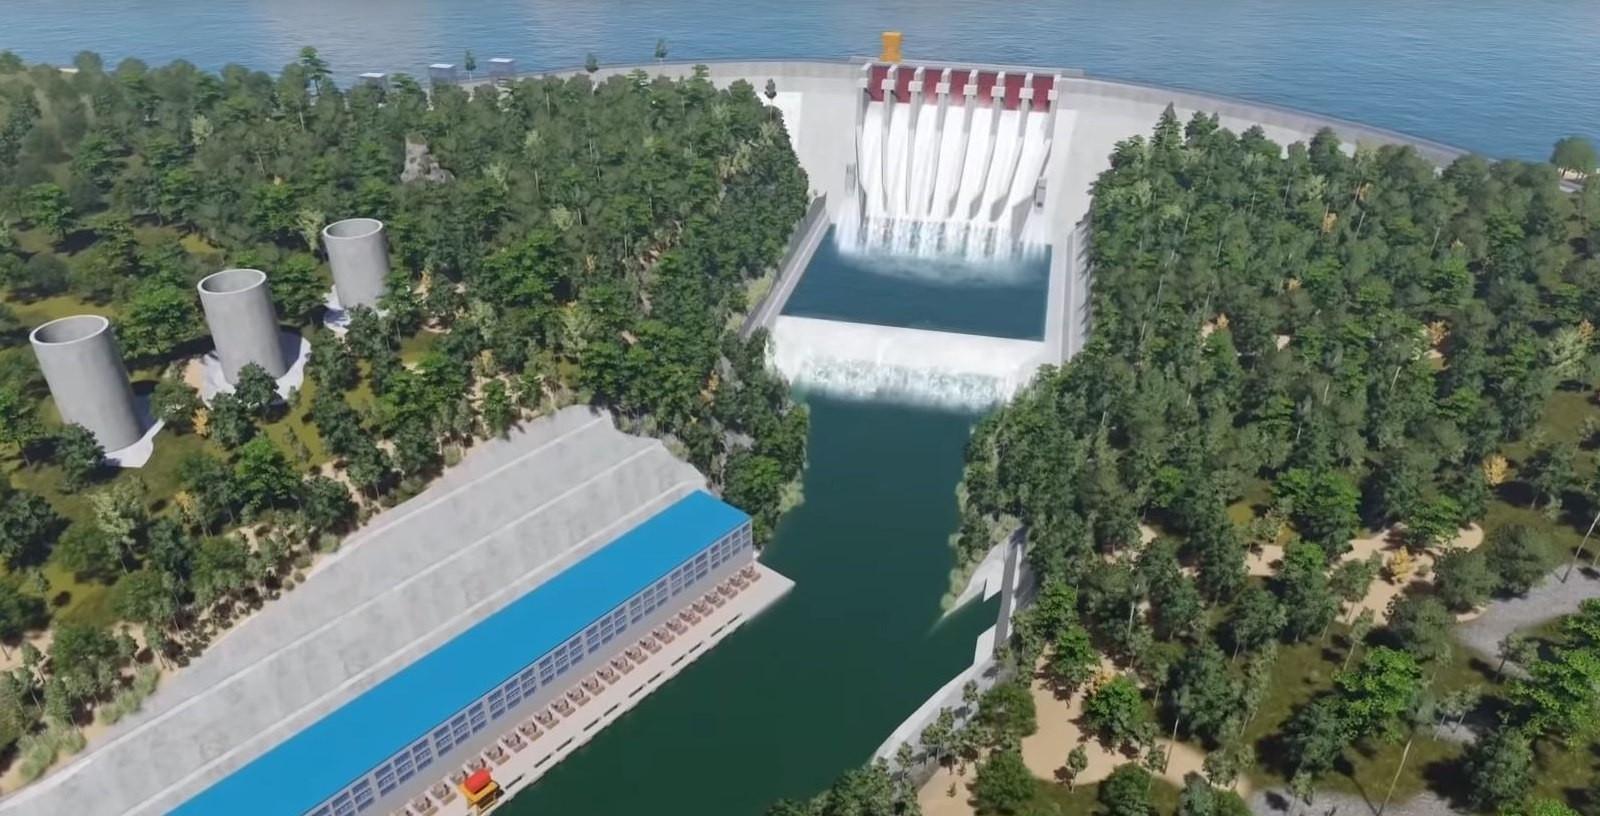 Rufiji_Hydropower_Plant_Contractors_Engineer_Tanzania_Elsewedy_IDOM_04